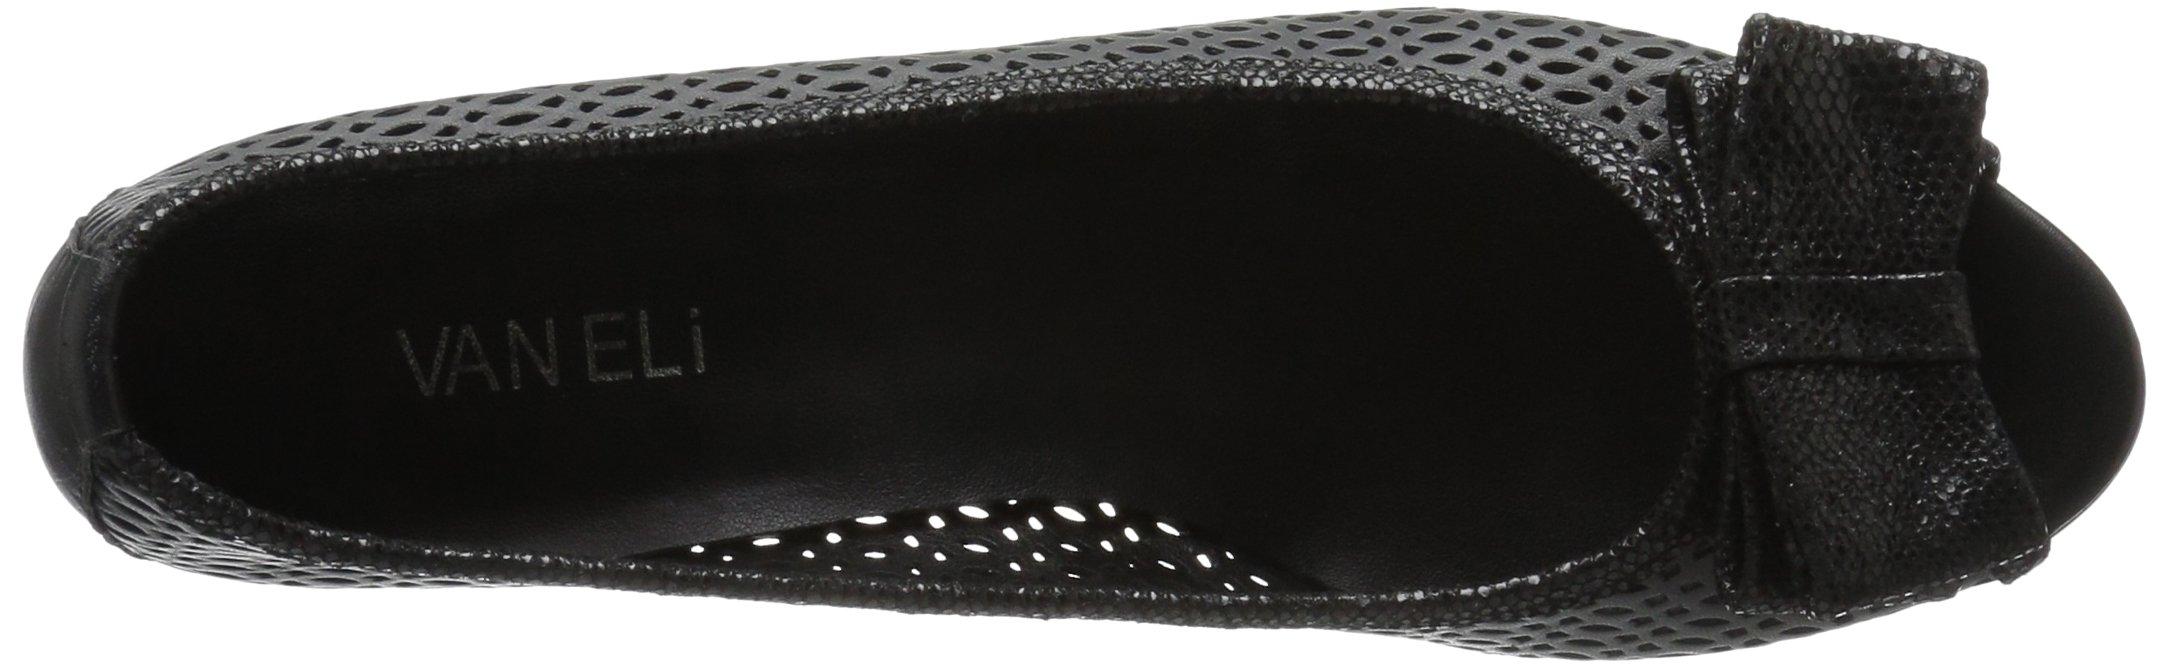 VANELi Women's Brinly Wedge Sandal, Black Perfed Nappa/Black Summer VIP, 9.5 N US by VANELi (Image #8)